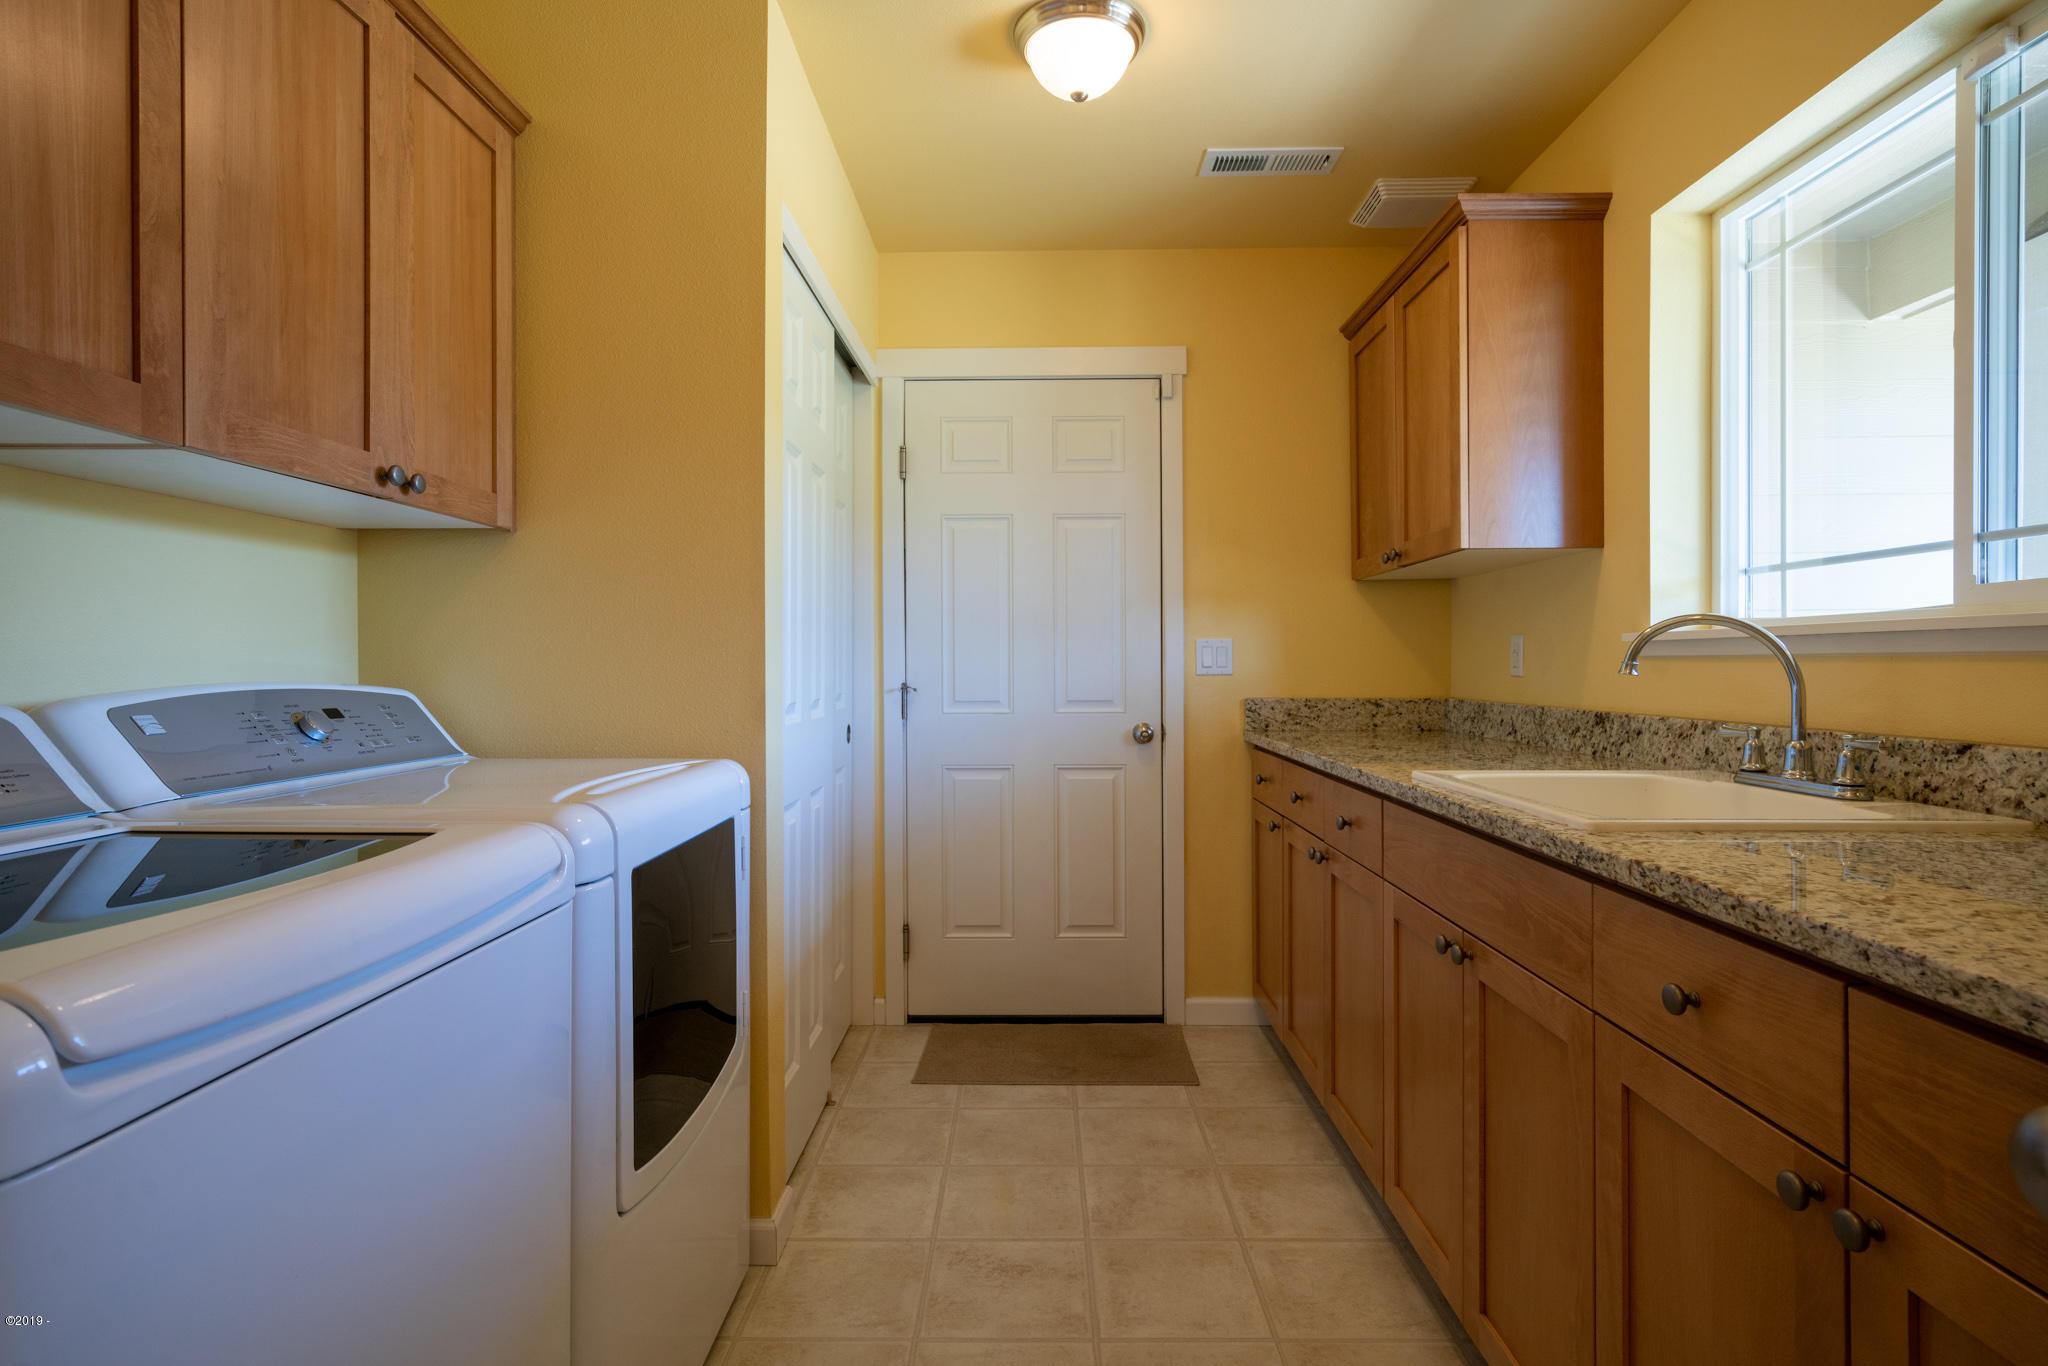 422 Gibson Lane, Logsden, OR 97357 (MLS:19-1735) | Doretta